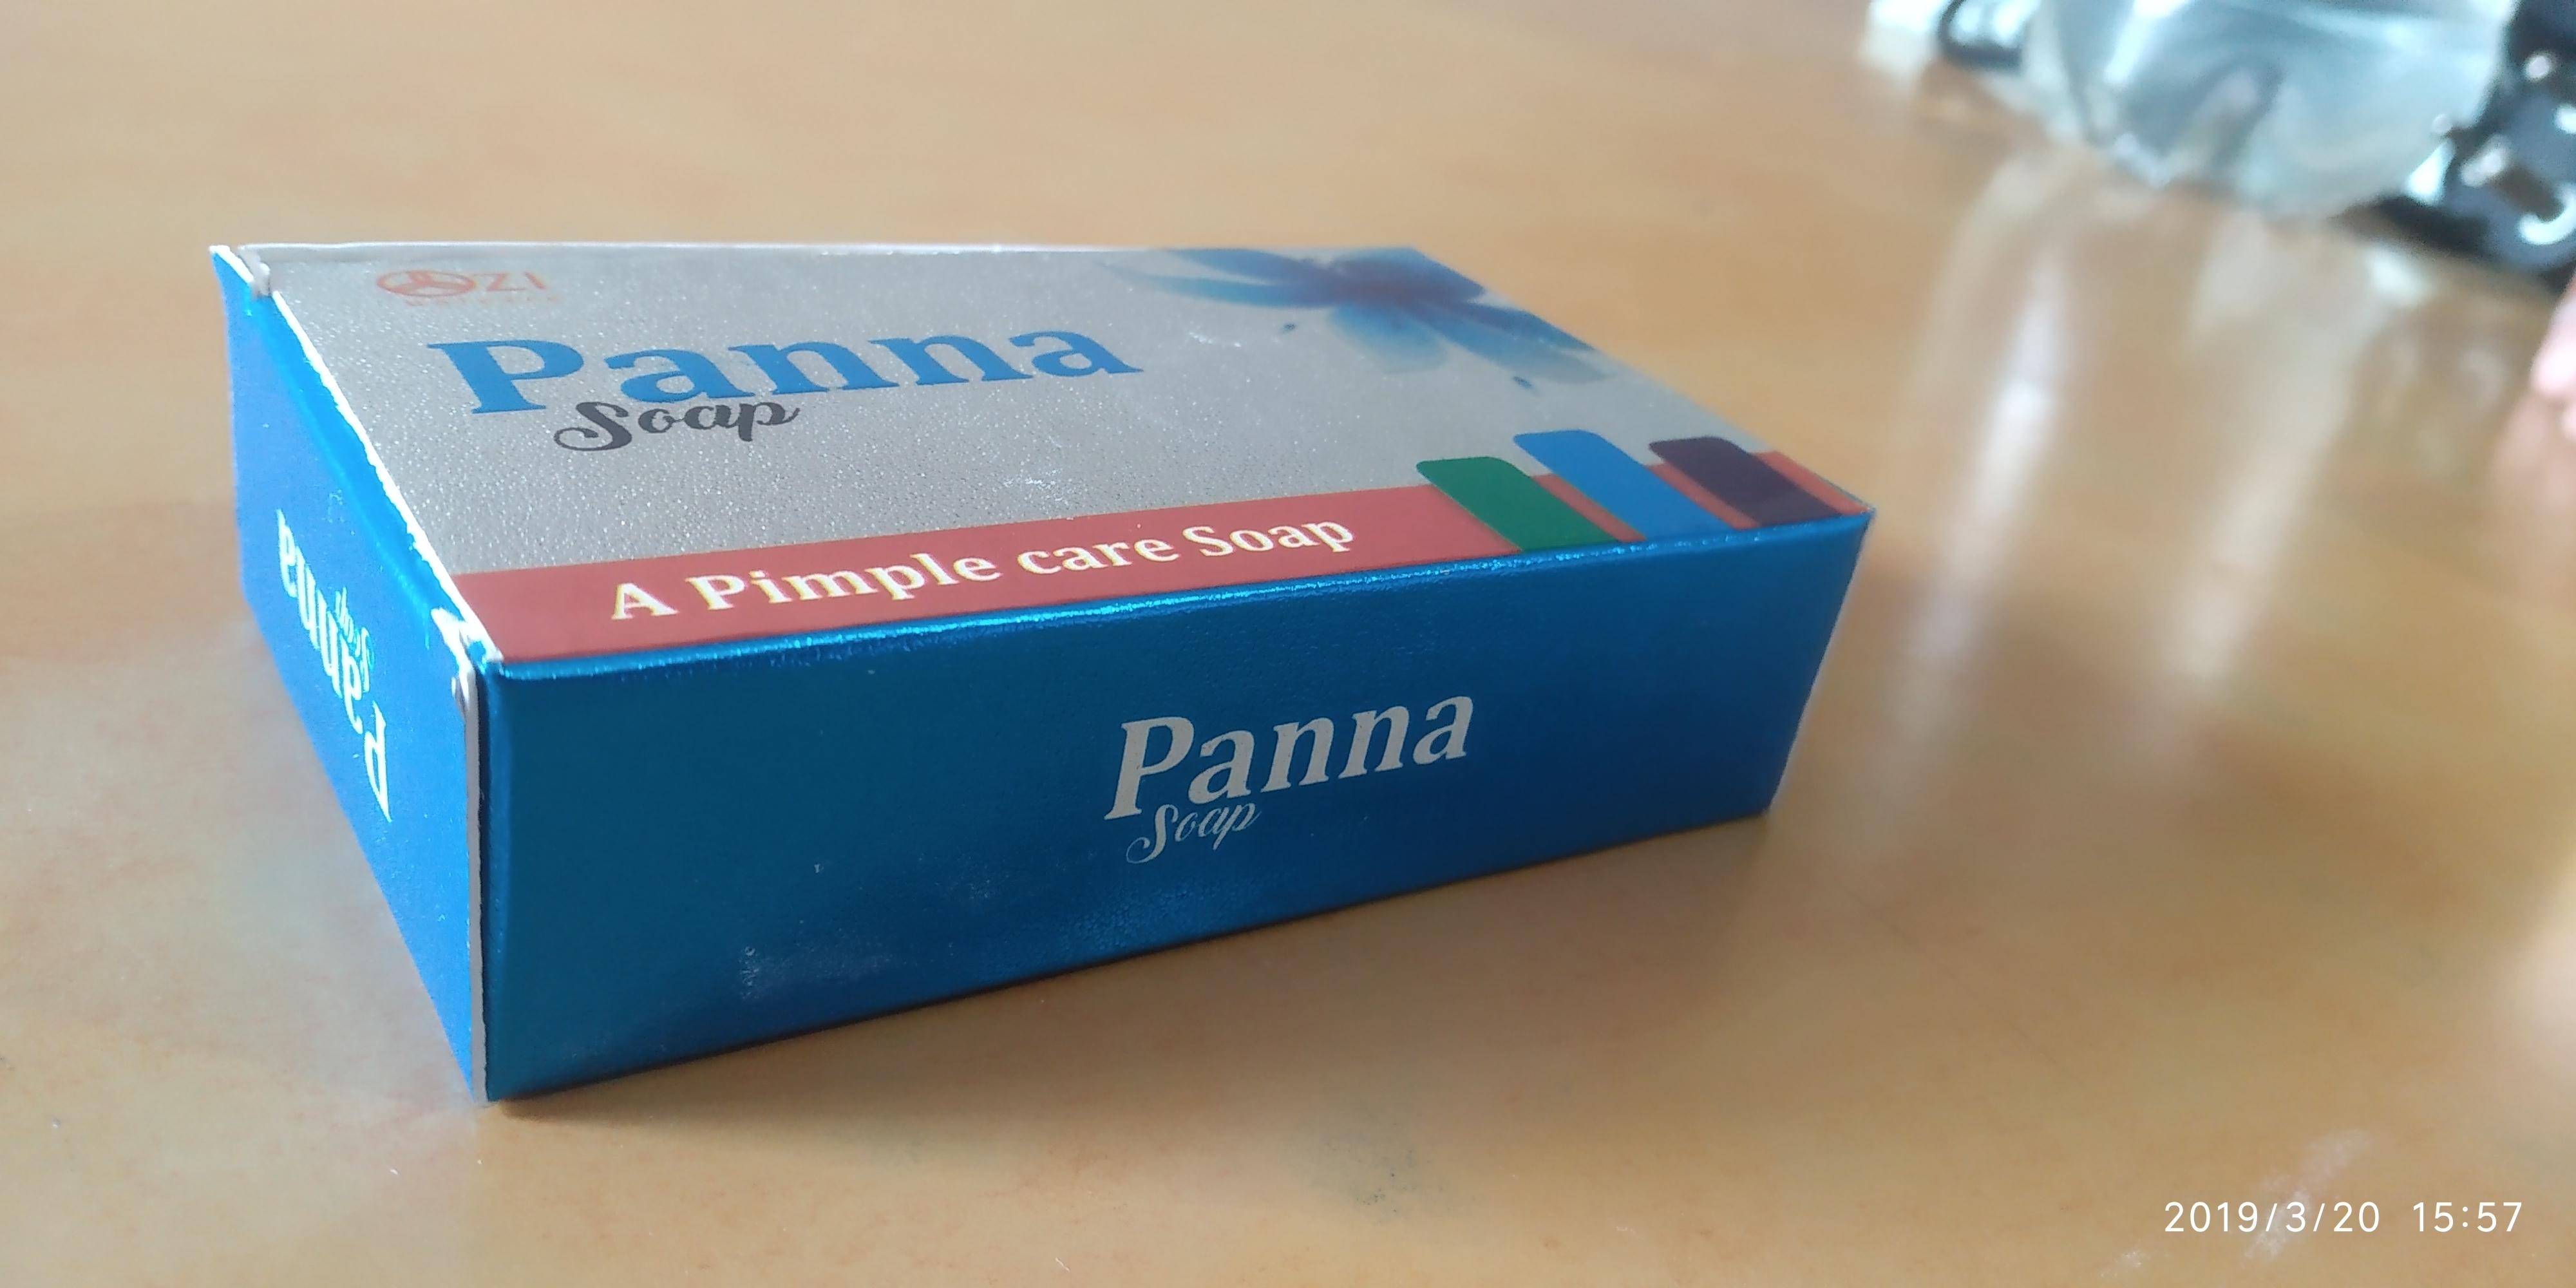 Pimple Care Soap